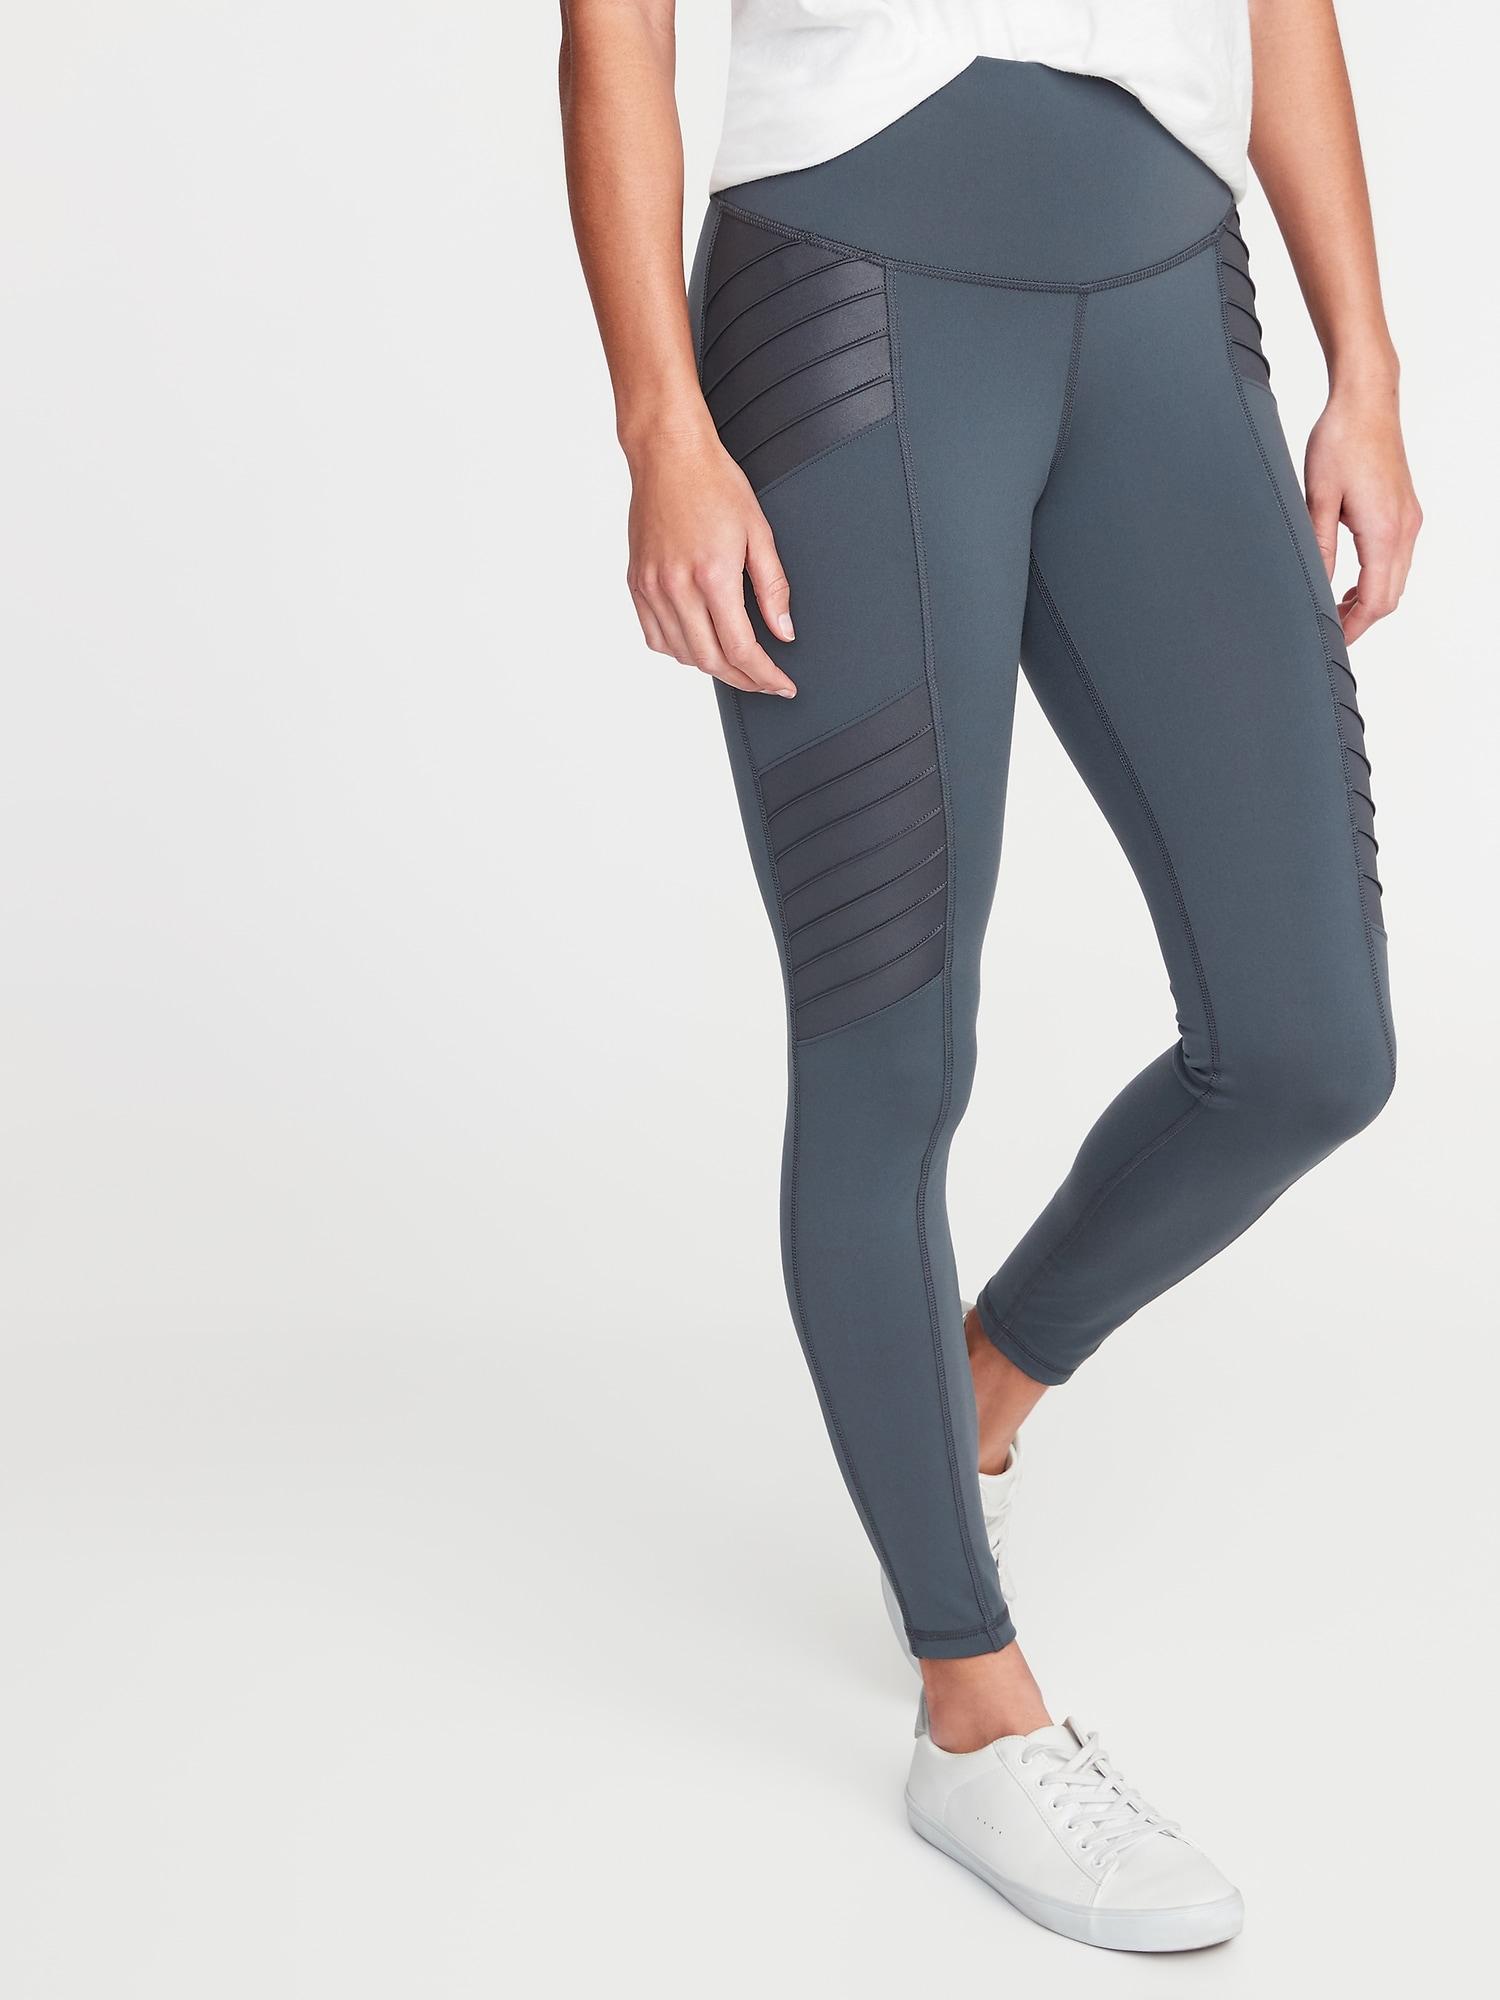 b638a890ad92a4 High-Rise Moto 7/8-Length Street Leggings for Women | Old Navy